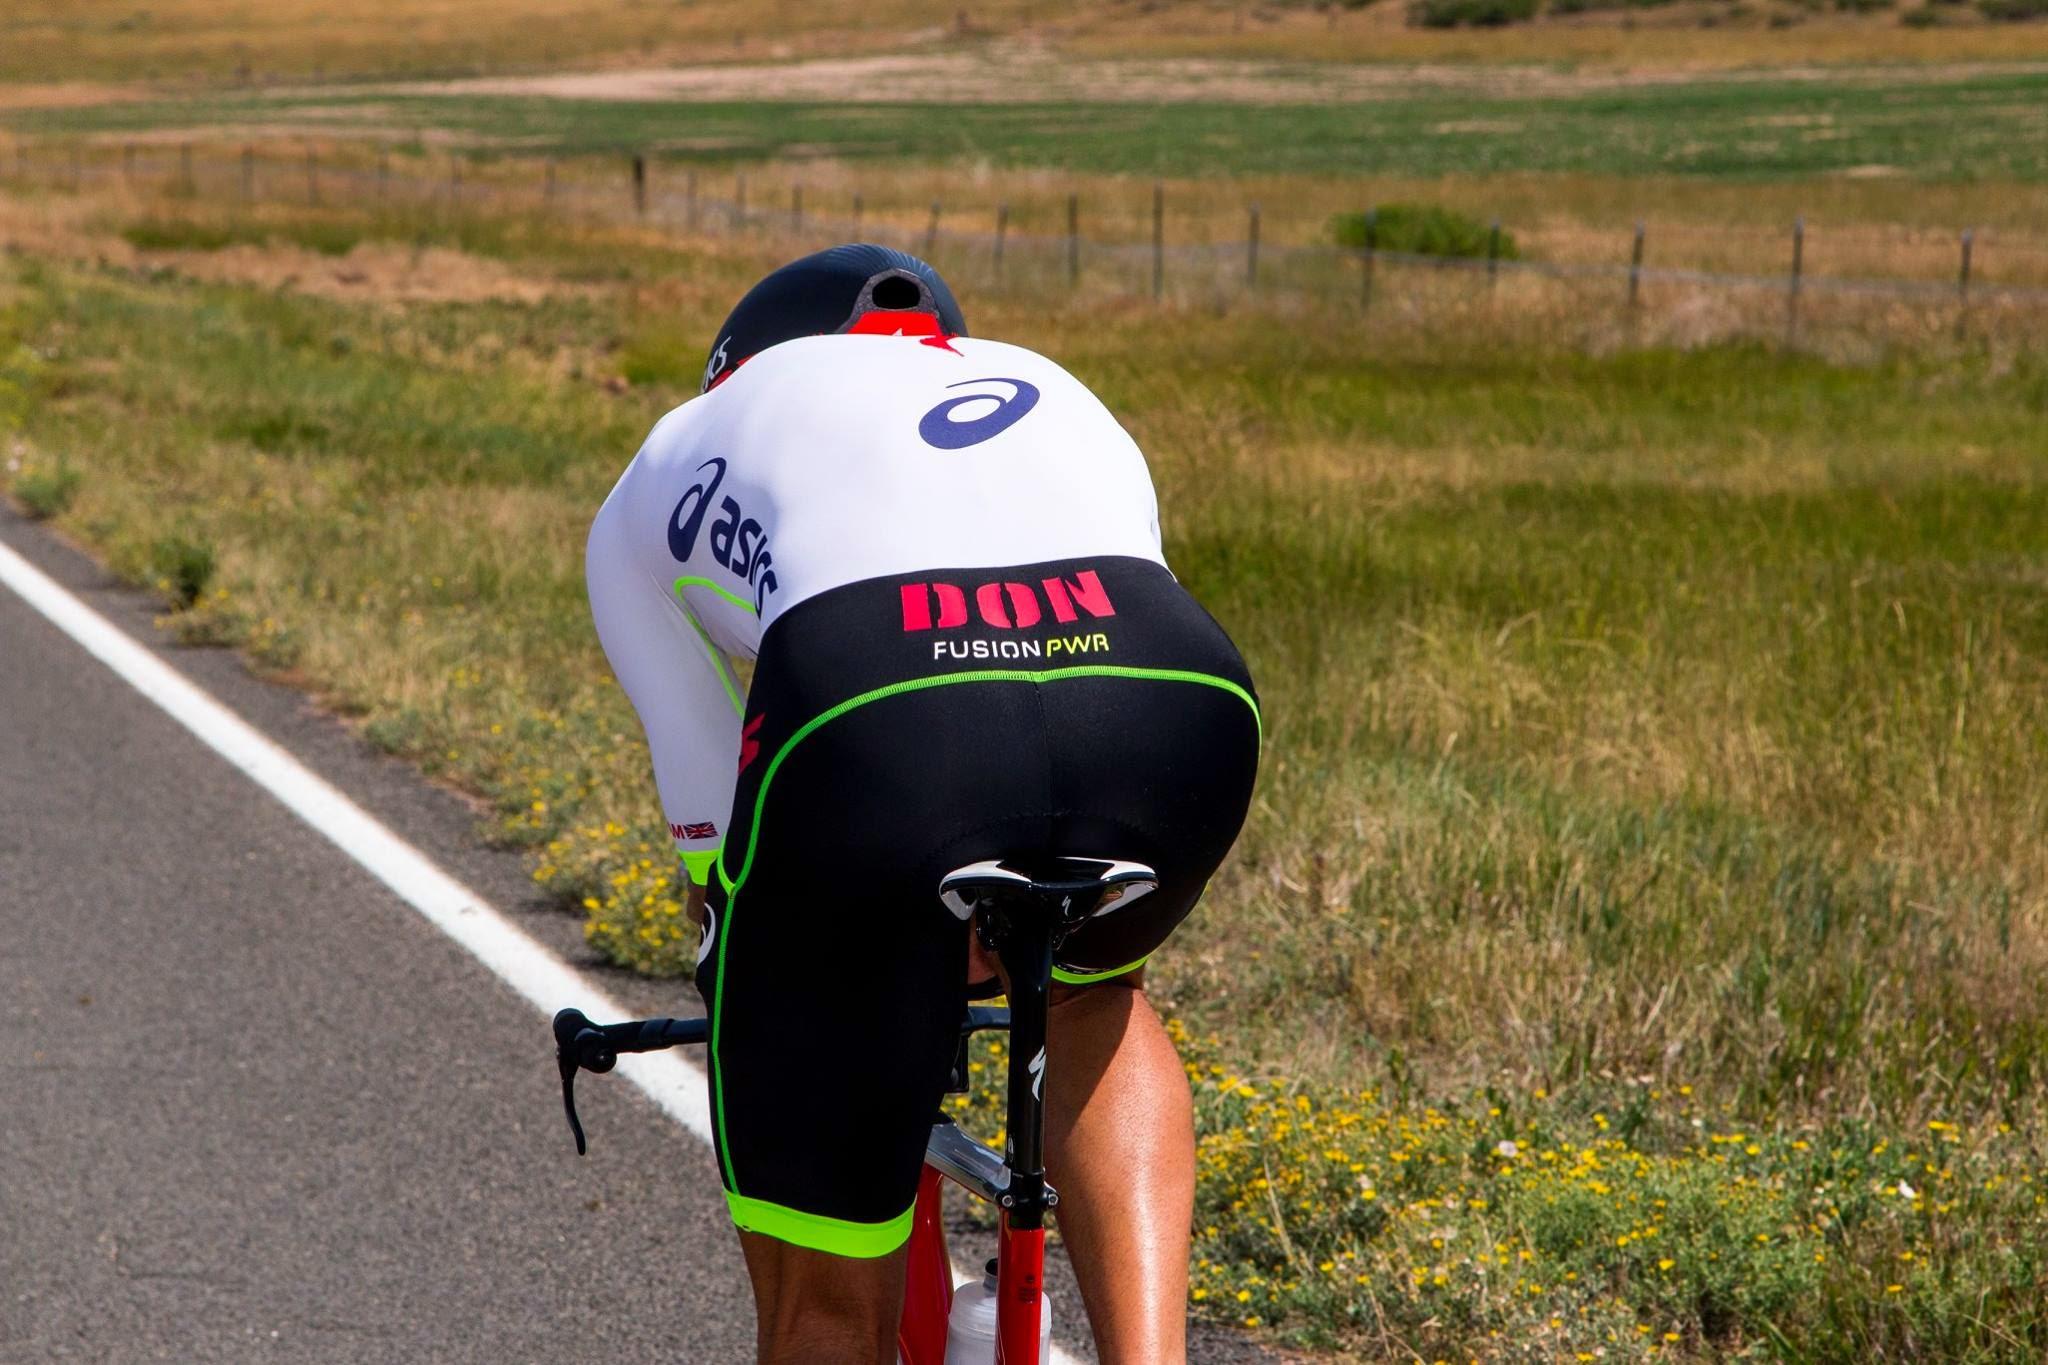 fusion-speedsuit-tim-don-gb-triathlete-rear.jpg